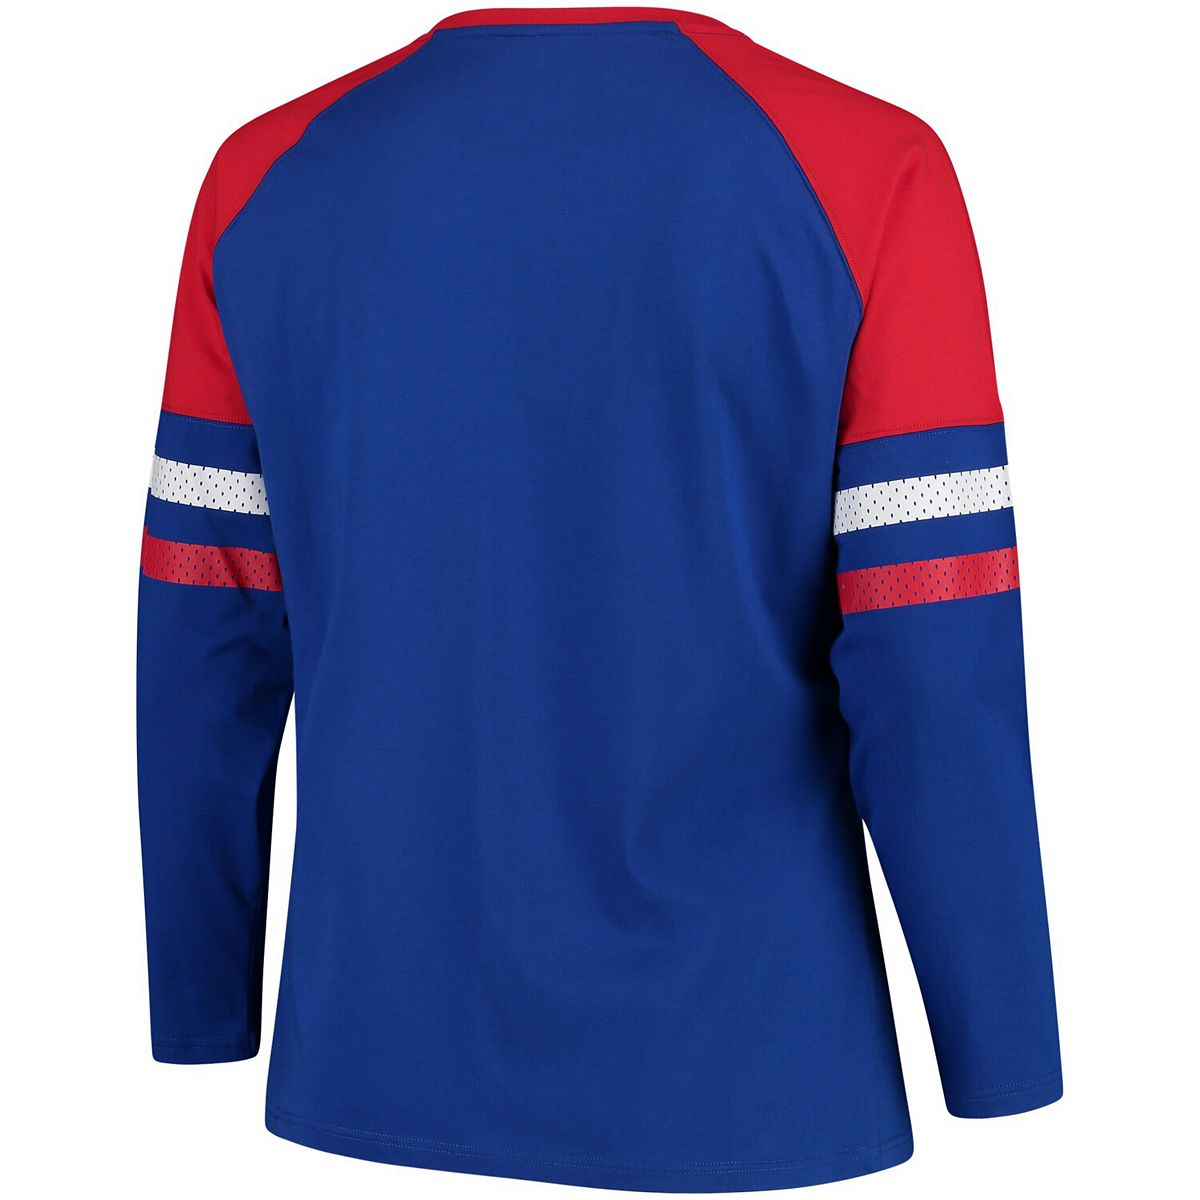 Women's Fanatics Branded Royal Philadelphia 76ers Plus Sizes Iconic Long Sleeve T-Shirt ADbuM